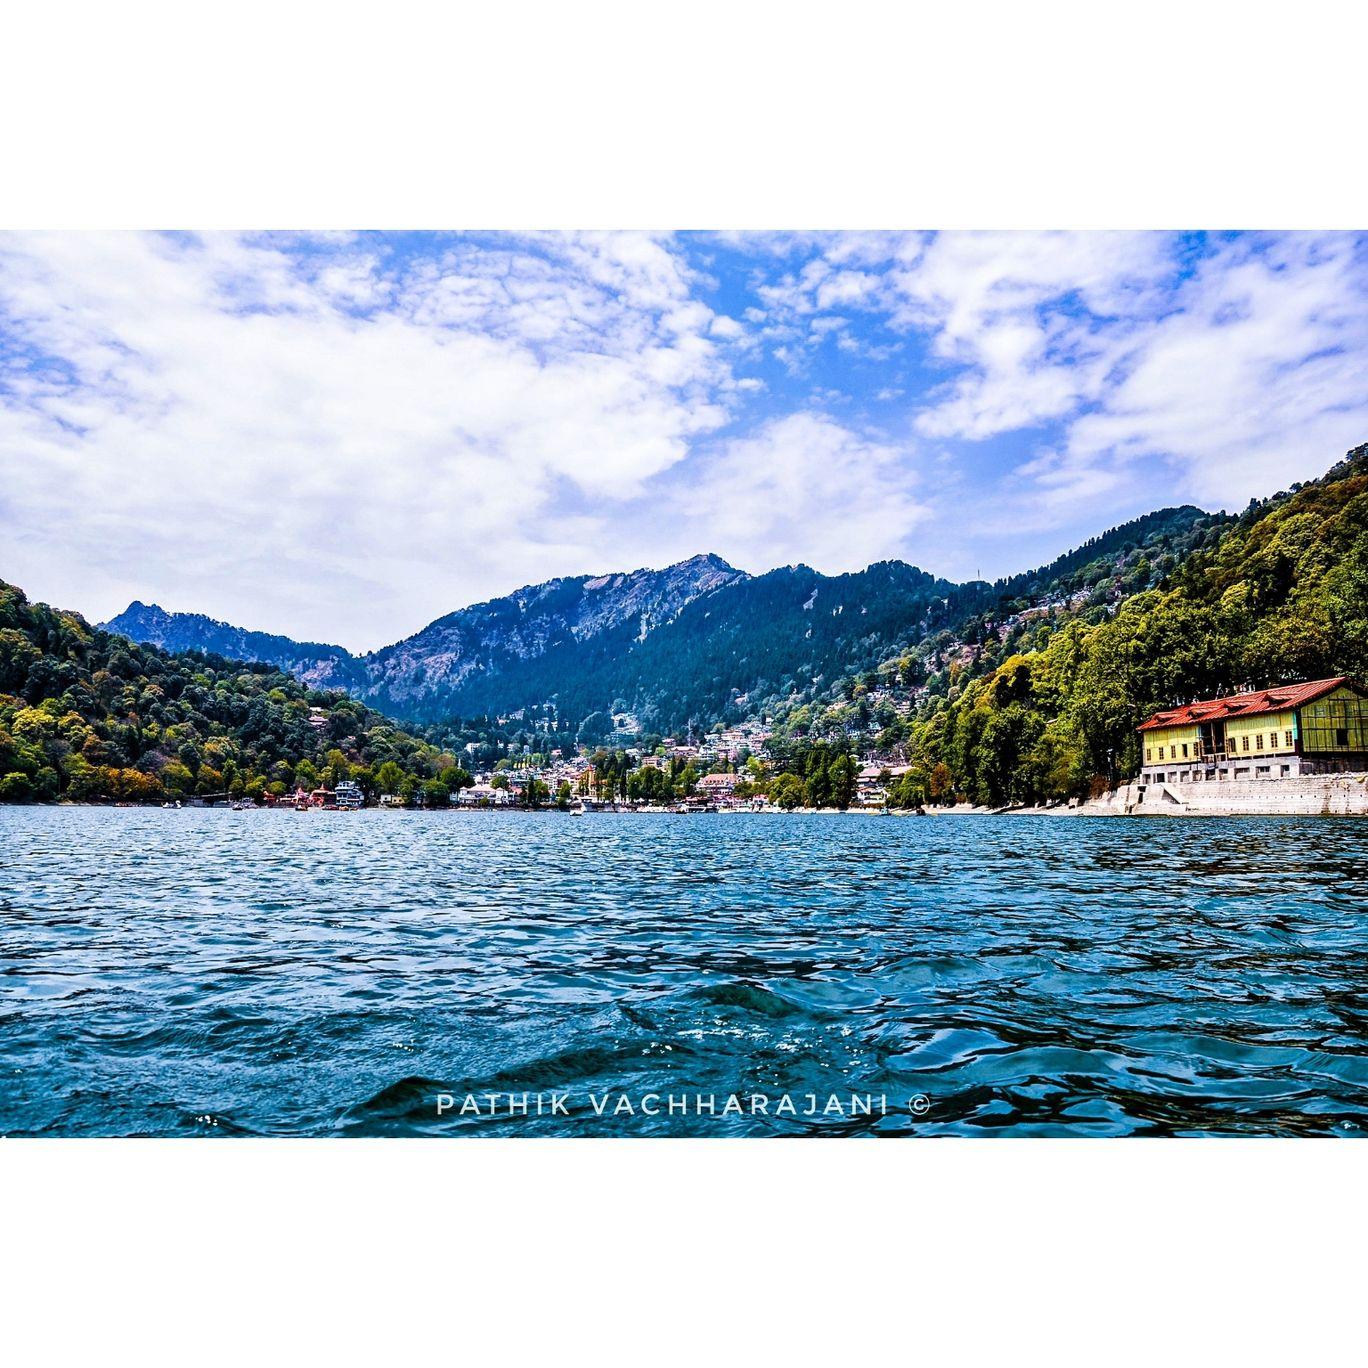 Photo of Nainital By Pathik Vachharajani